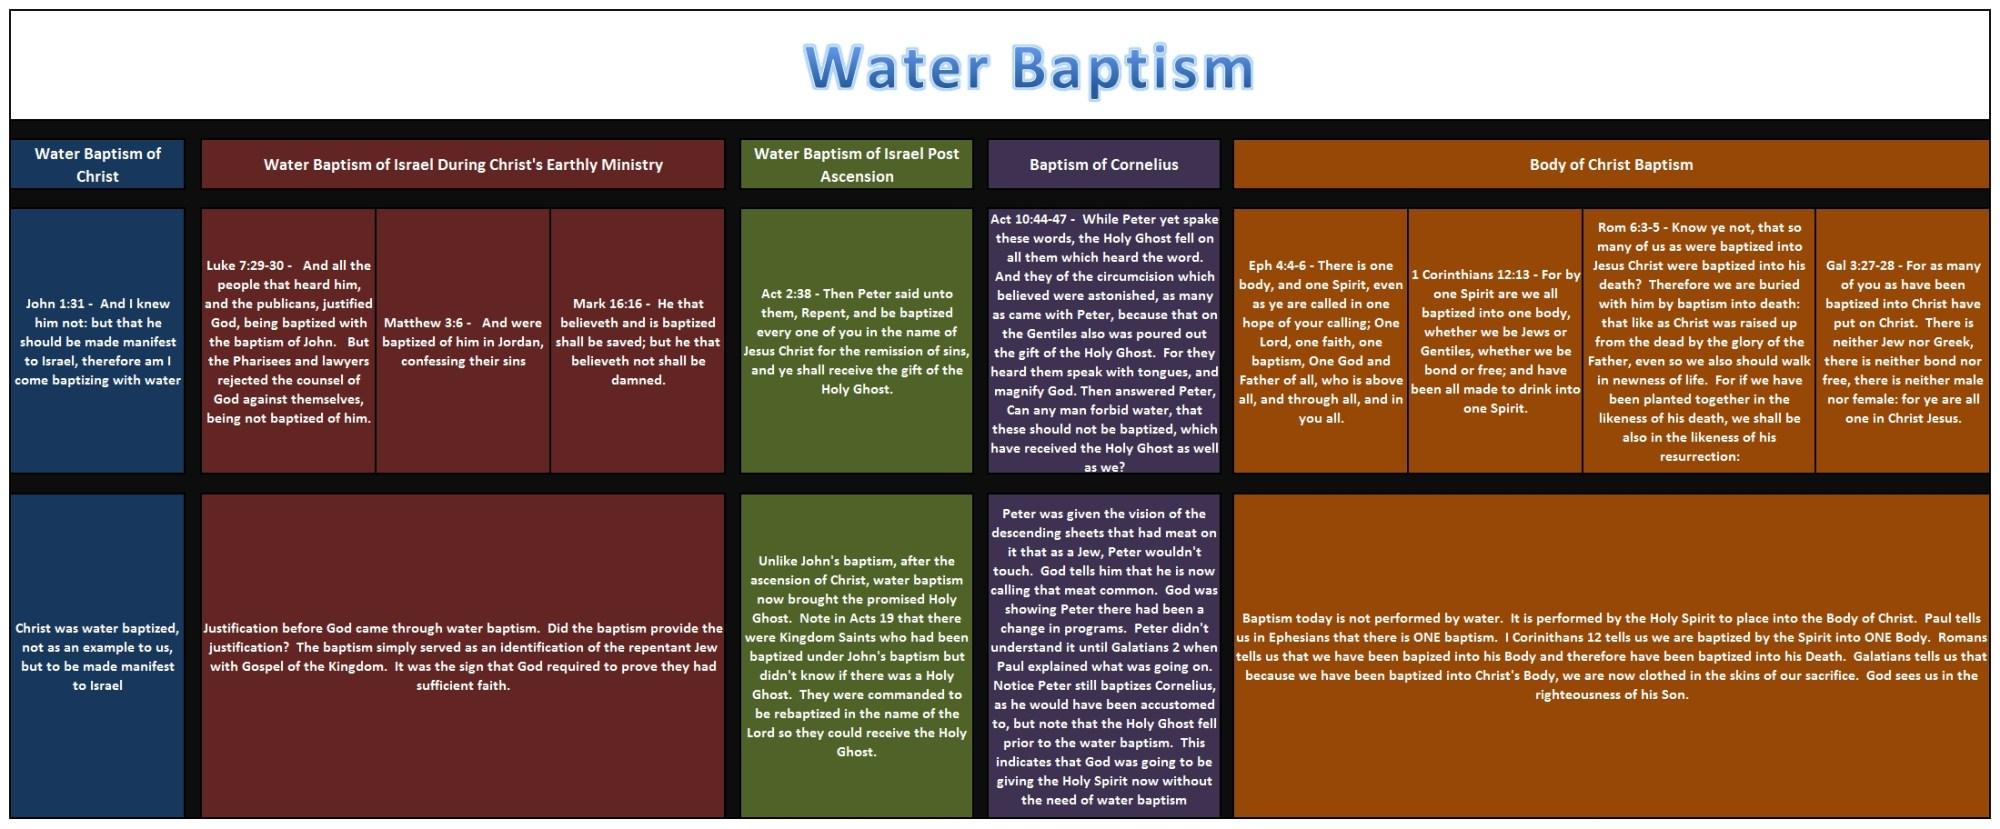 hight resolution of source http paulsthepattern wordpress com 2011 08 12 water baptism breakdown